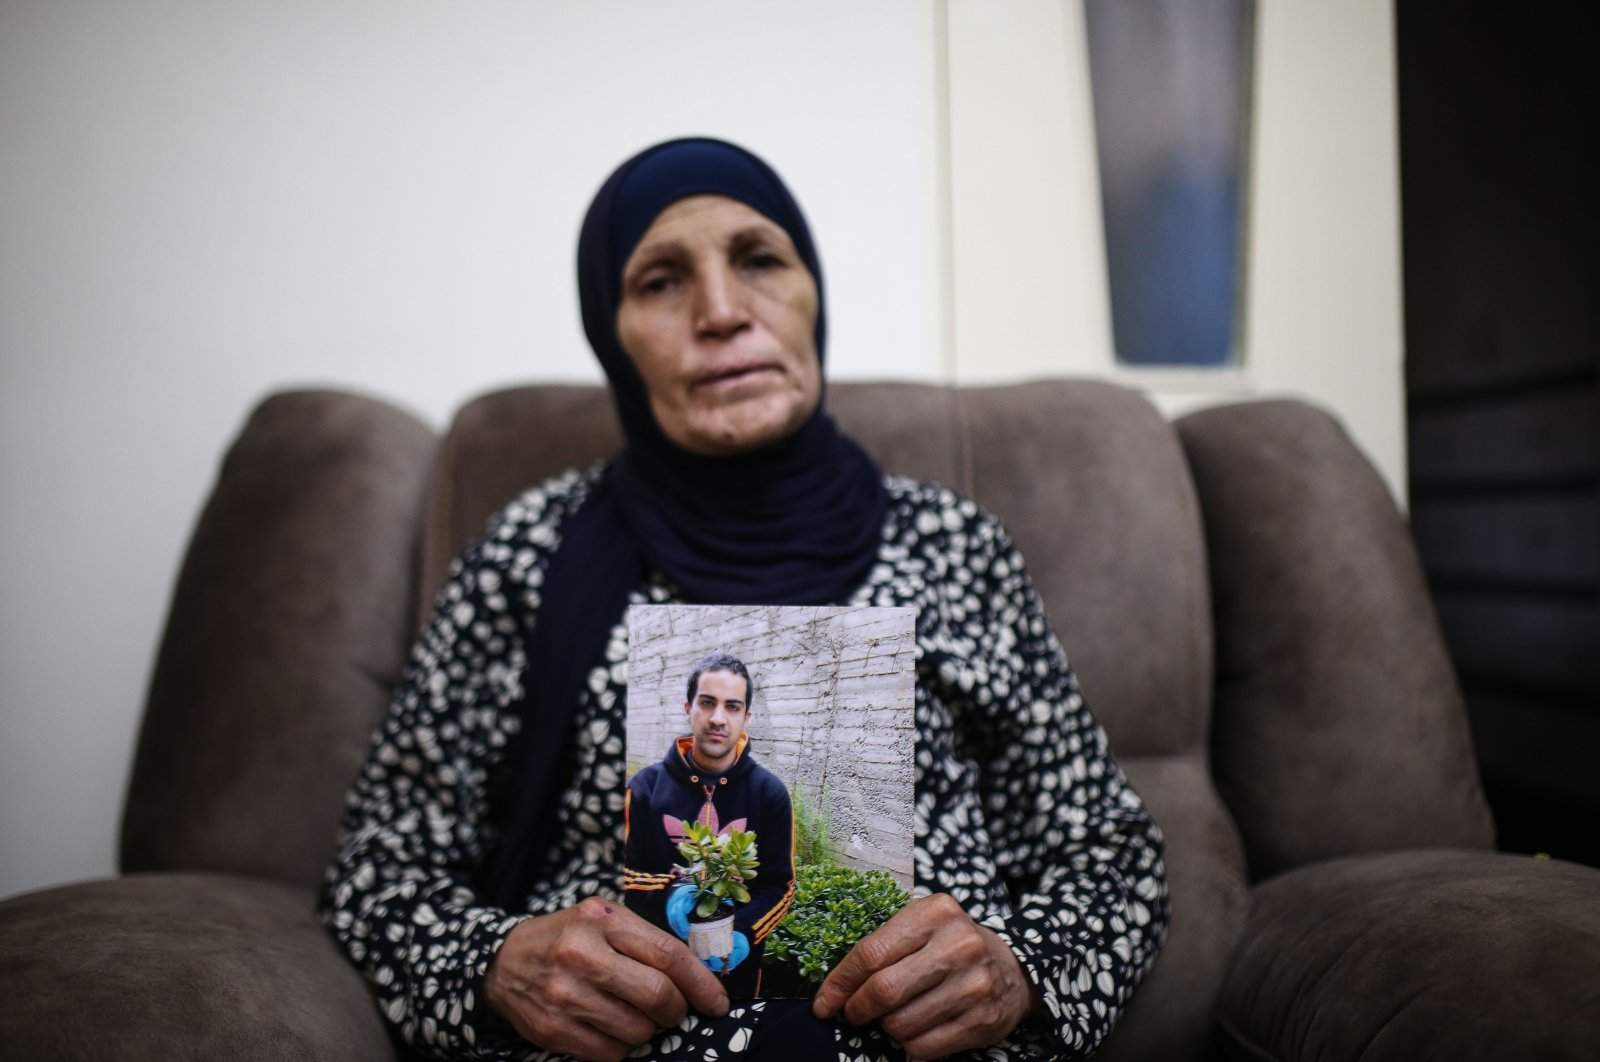 Rana el-Hallak speaks to Anadolu Agency about her son Iyad's death by Israeli police, in Jerusalem on June 7, 2020. (AA Photo)